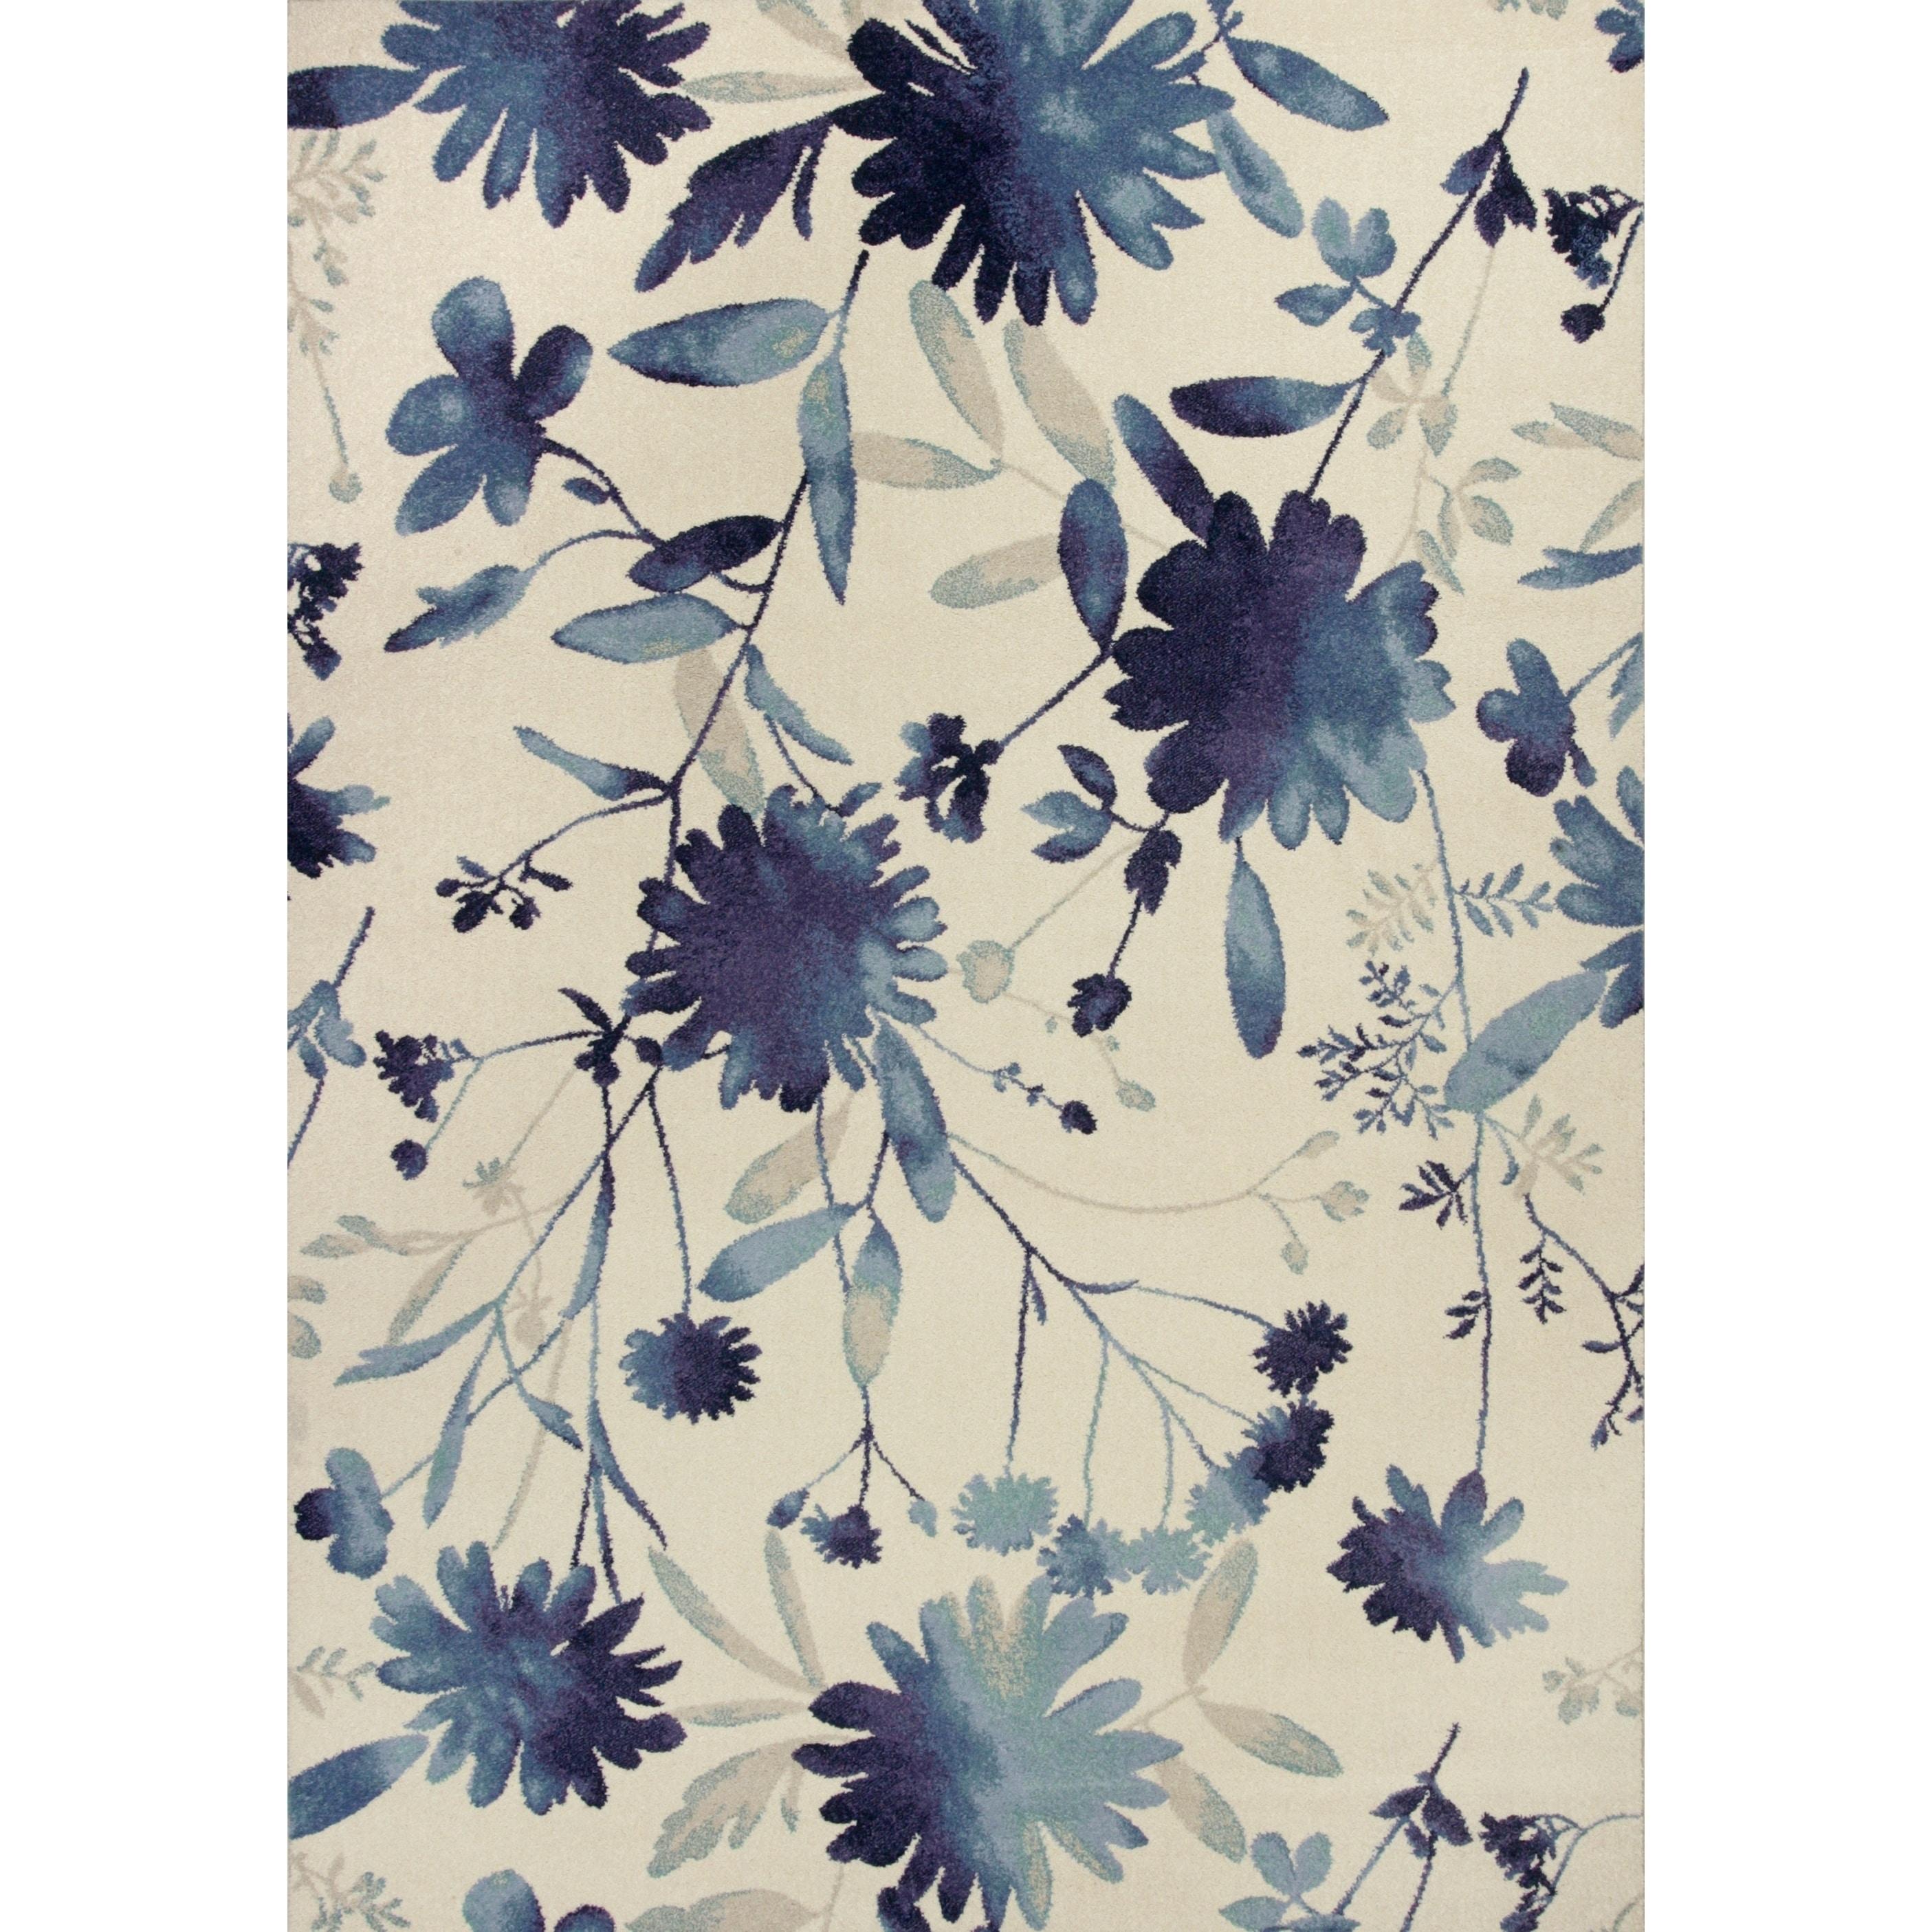 Domani Madison Blue Floral Watercolors Area Rug Blue 6 7 X 9 6